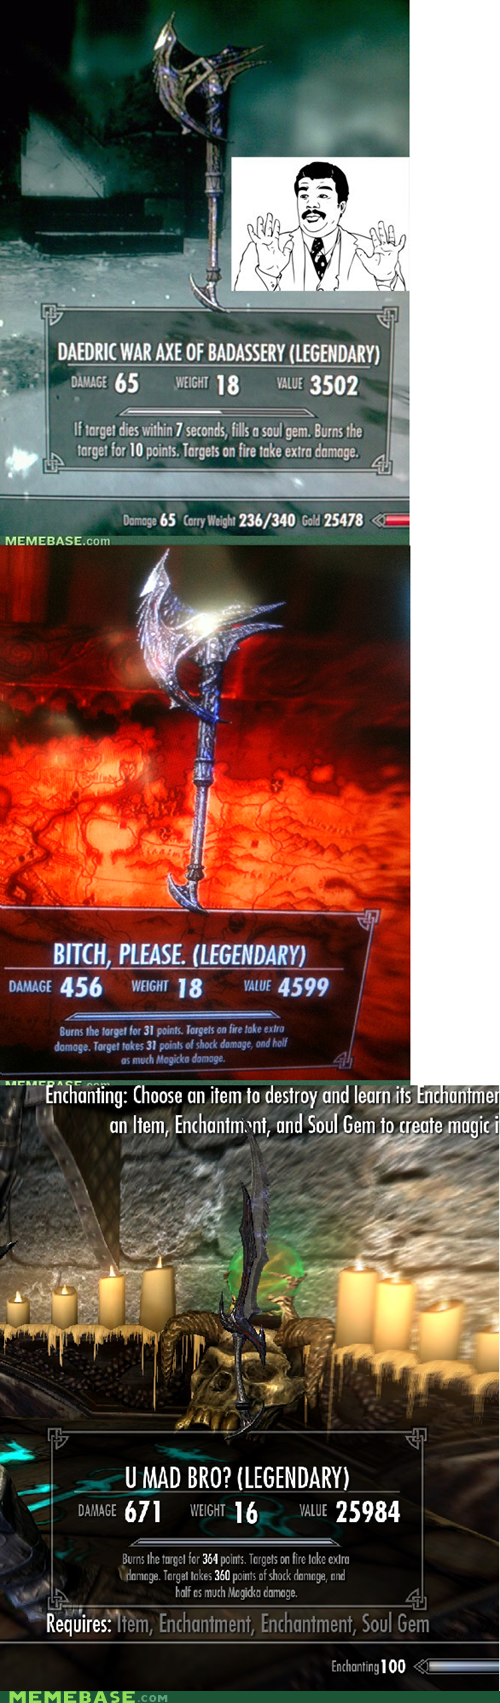 Badass please Reframe Skyrim u mad video games - 5533755392